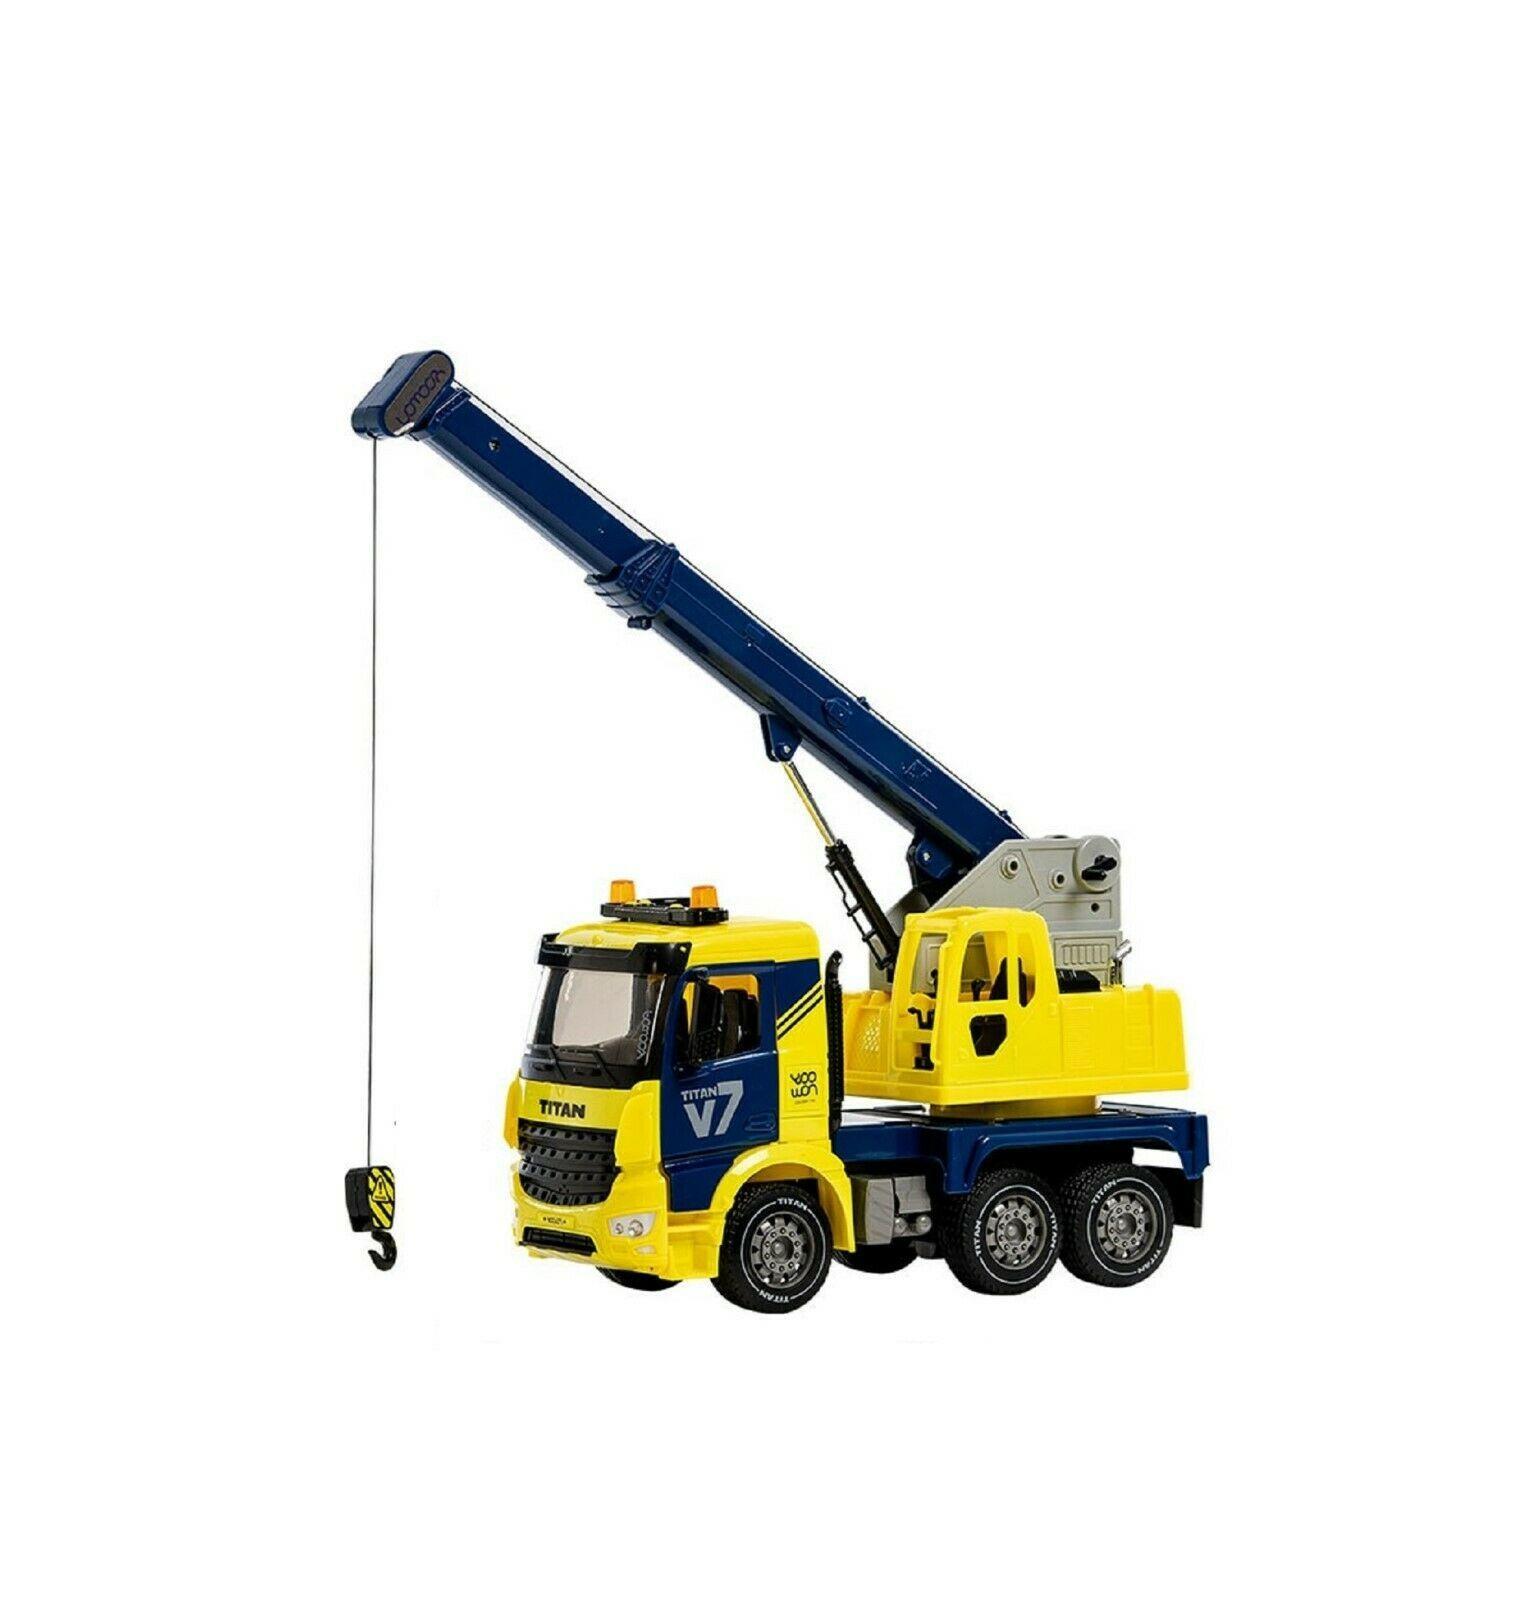 Yoowon Toys Crane Truck Car Vehicle Sound Effect Lights Heavy Equipment Play Toy